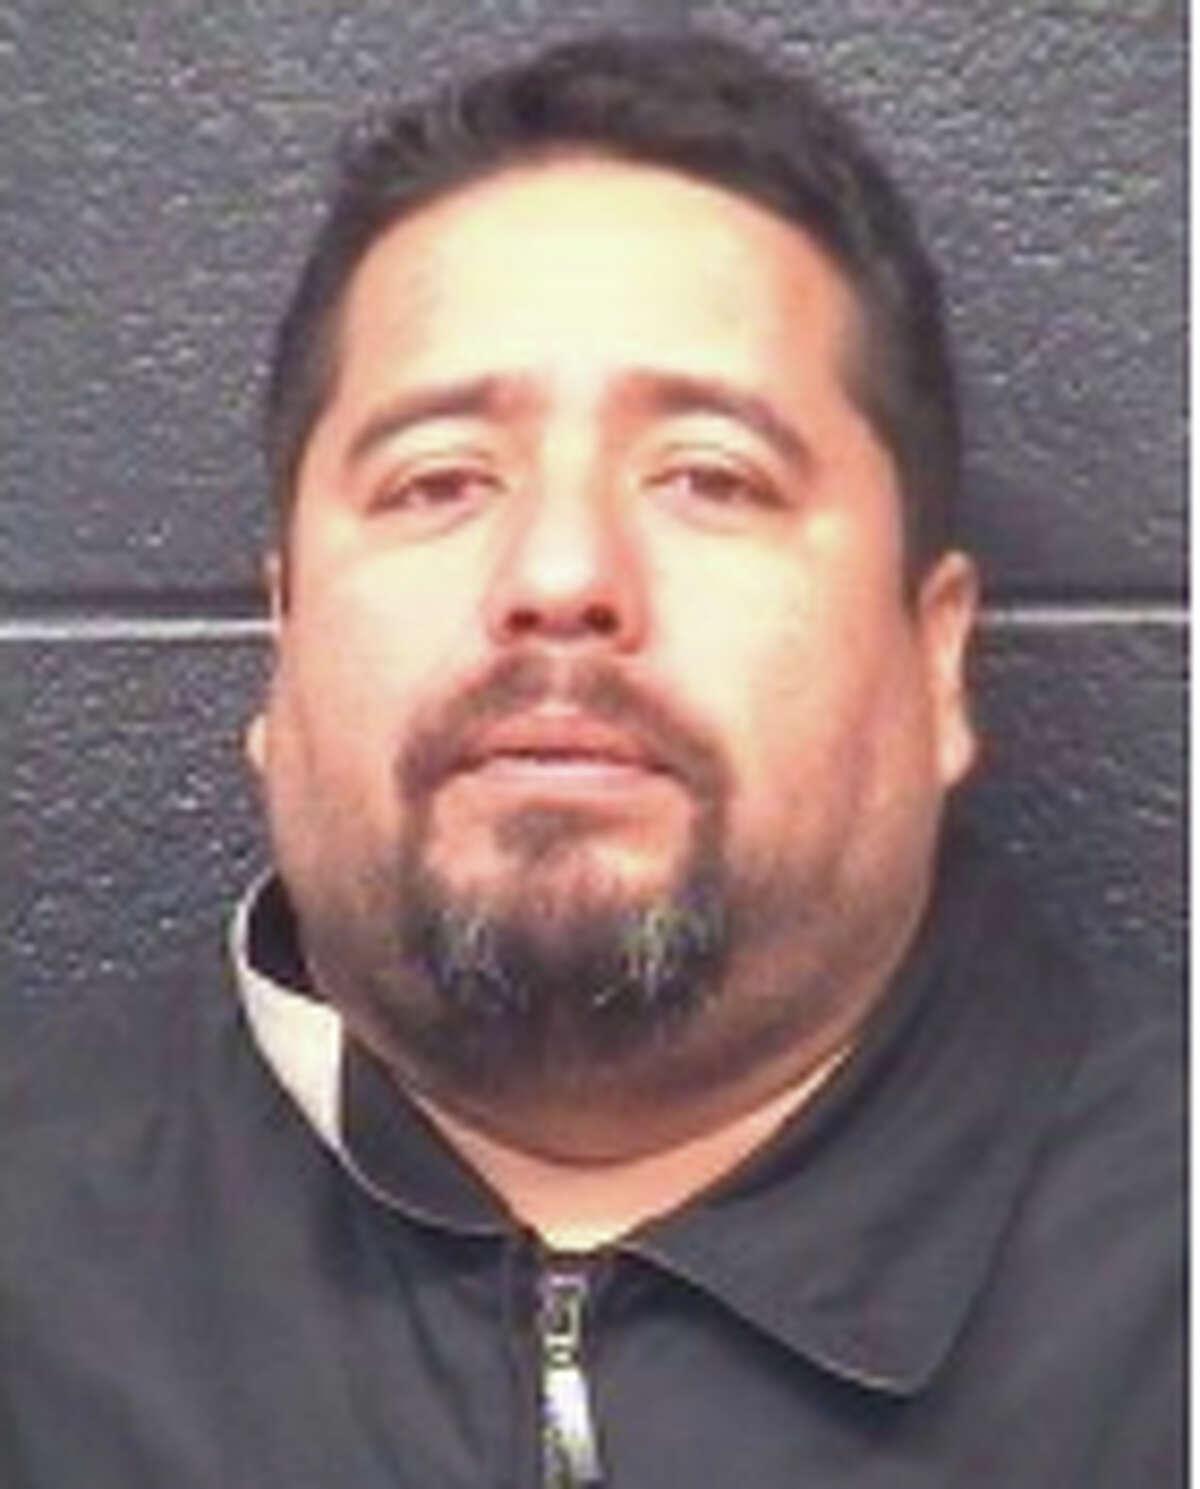 Dany Mendoza Ramirez driving while intoxicated